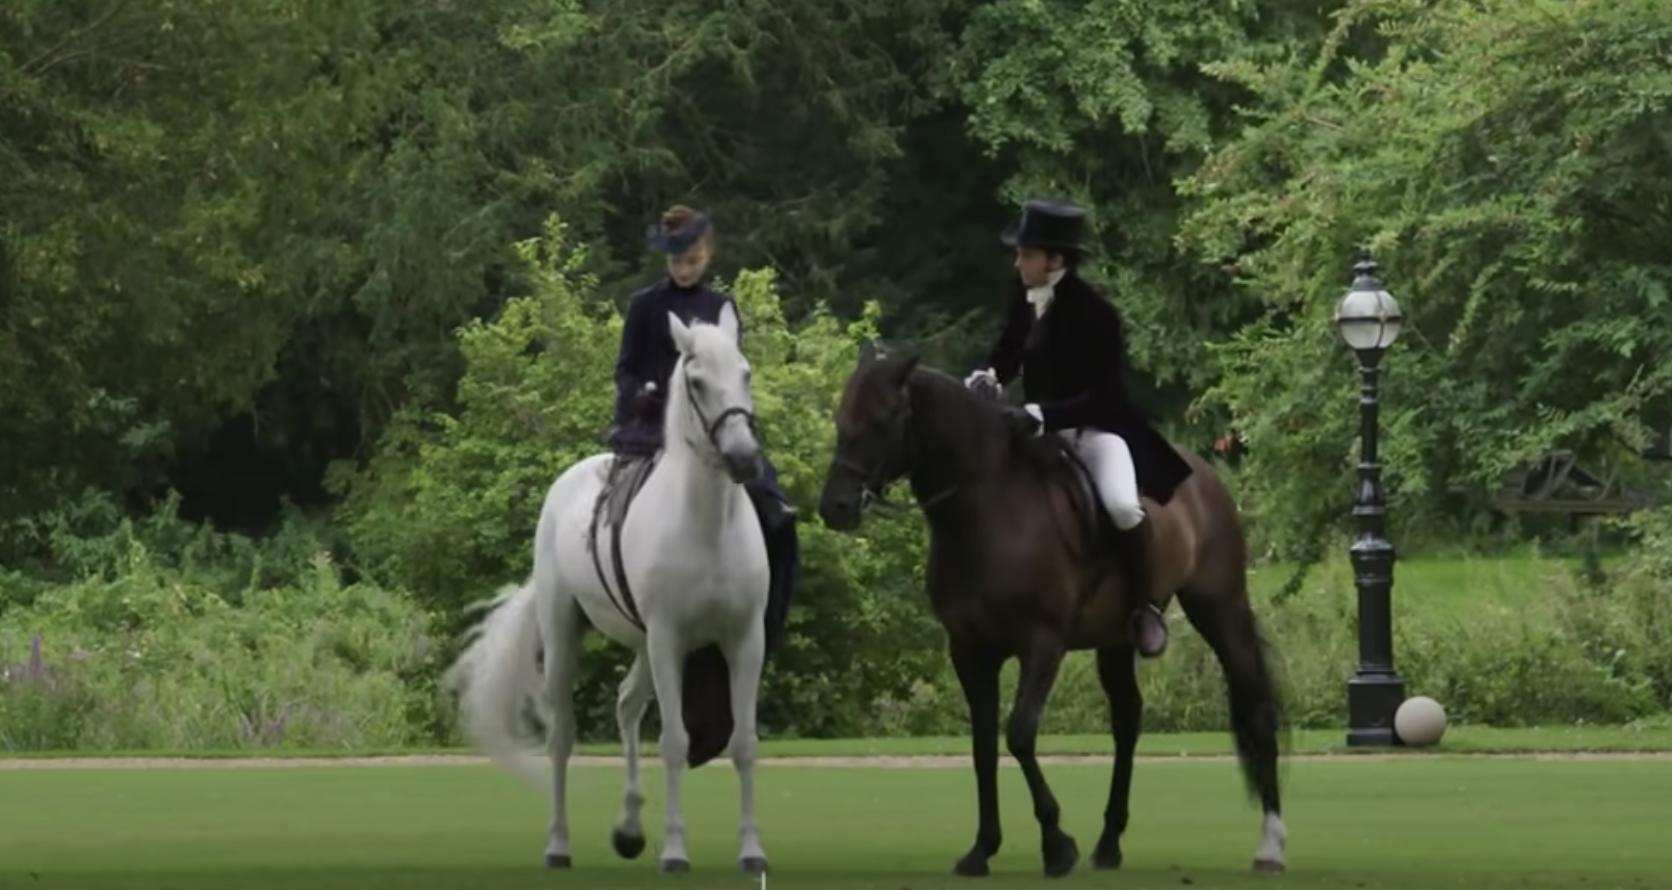 Anthony and Daphne riding horses